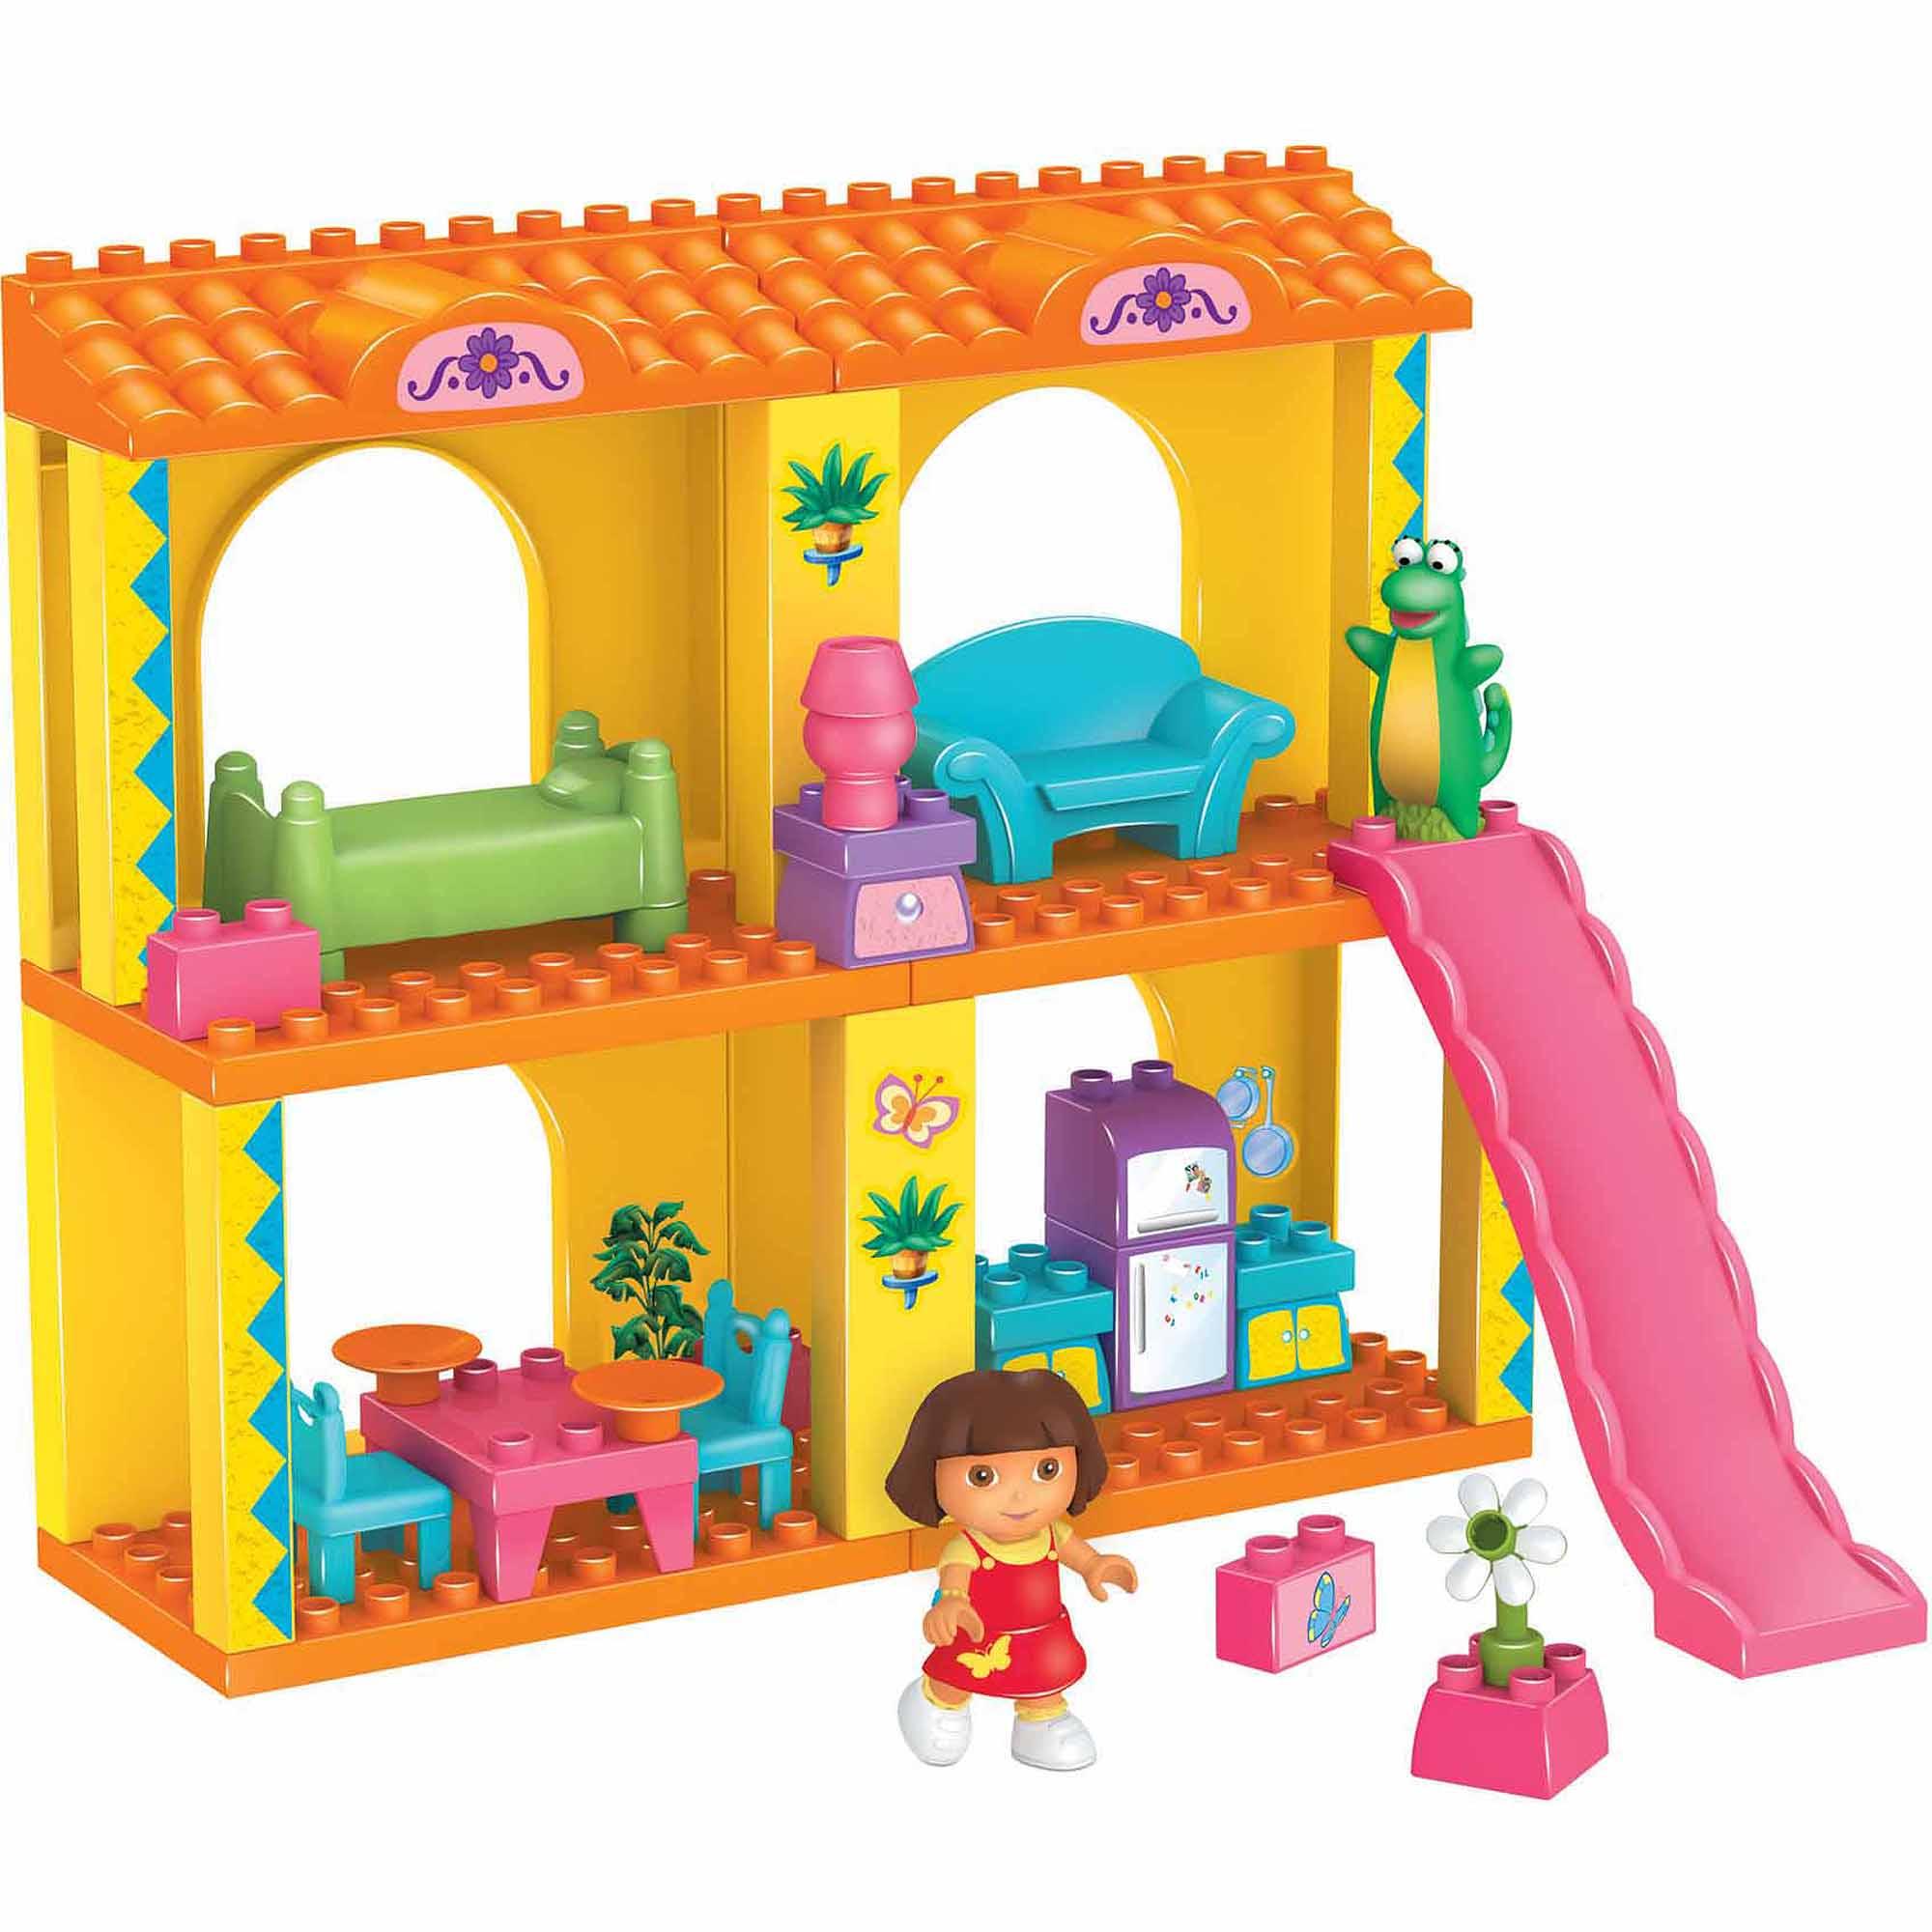 Dora the Explorer Mega Bloks Dora's Playtime Adventure Play Set